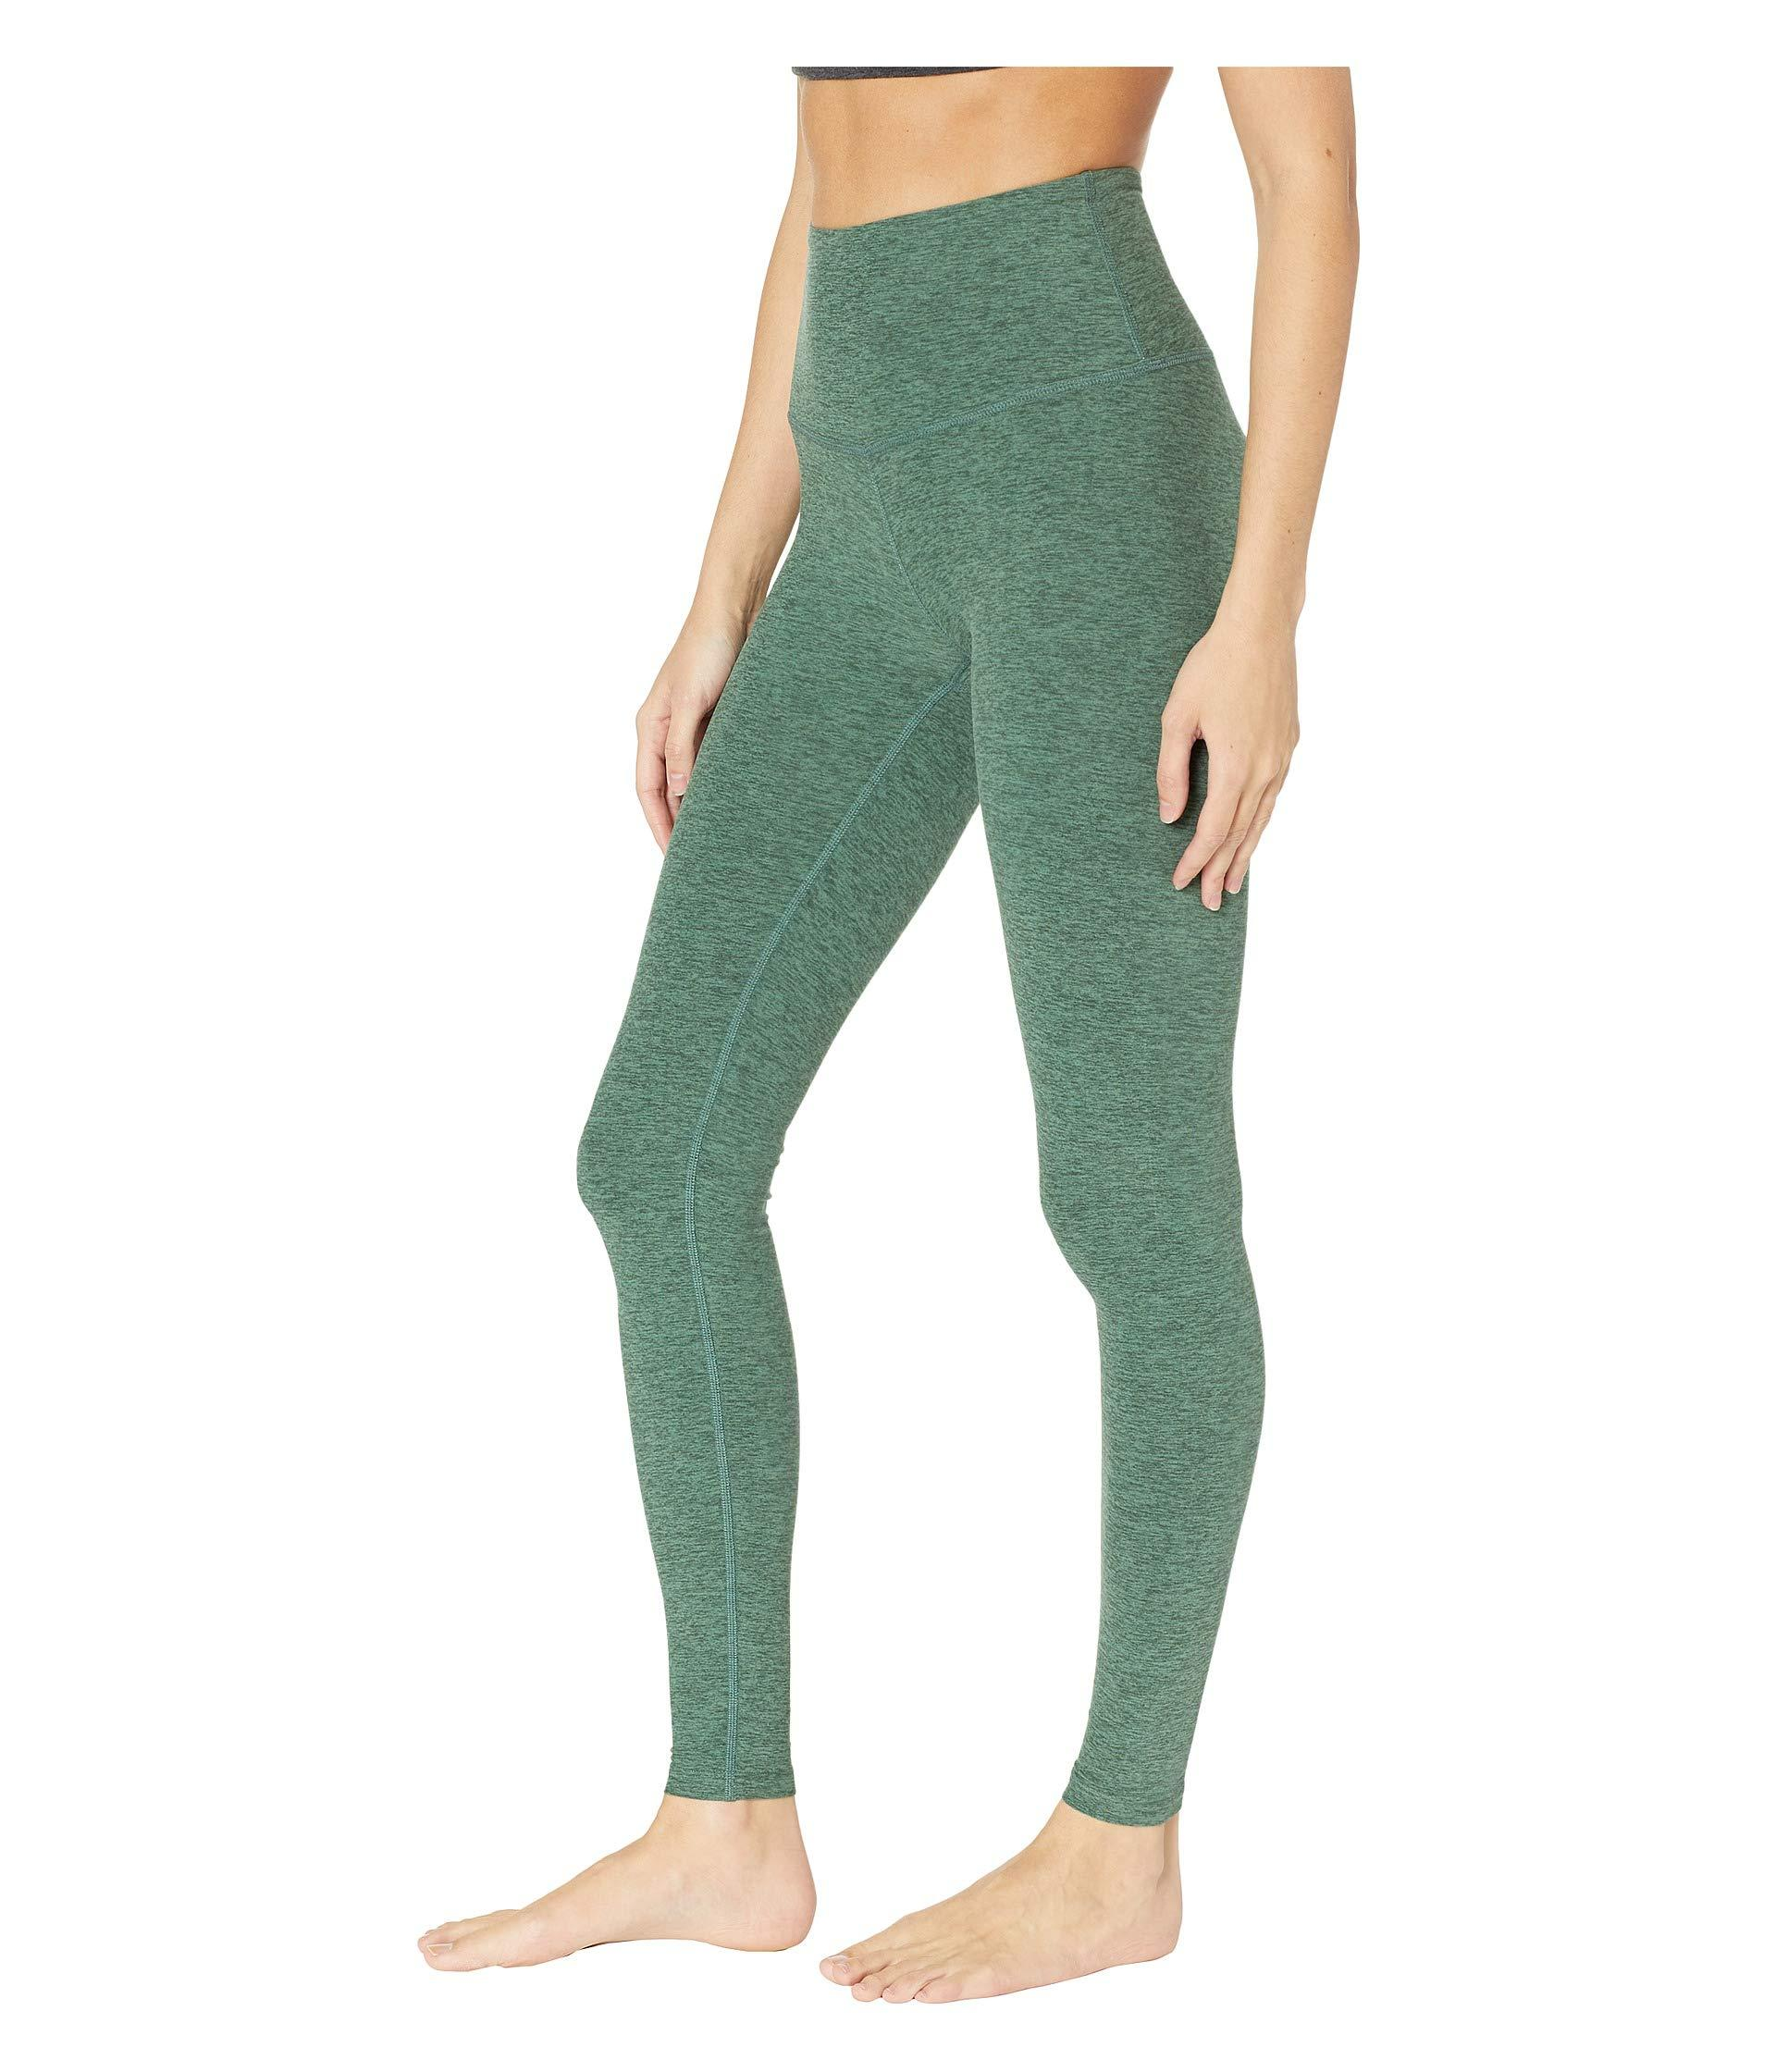 ebf6f620c37bd Lyst - Beyond Yoga High Waist Long Legging (black/white) Women's Workout in  Green